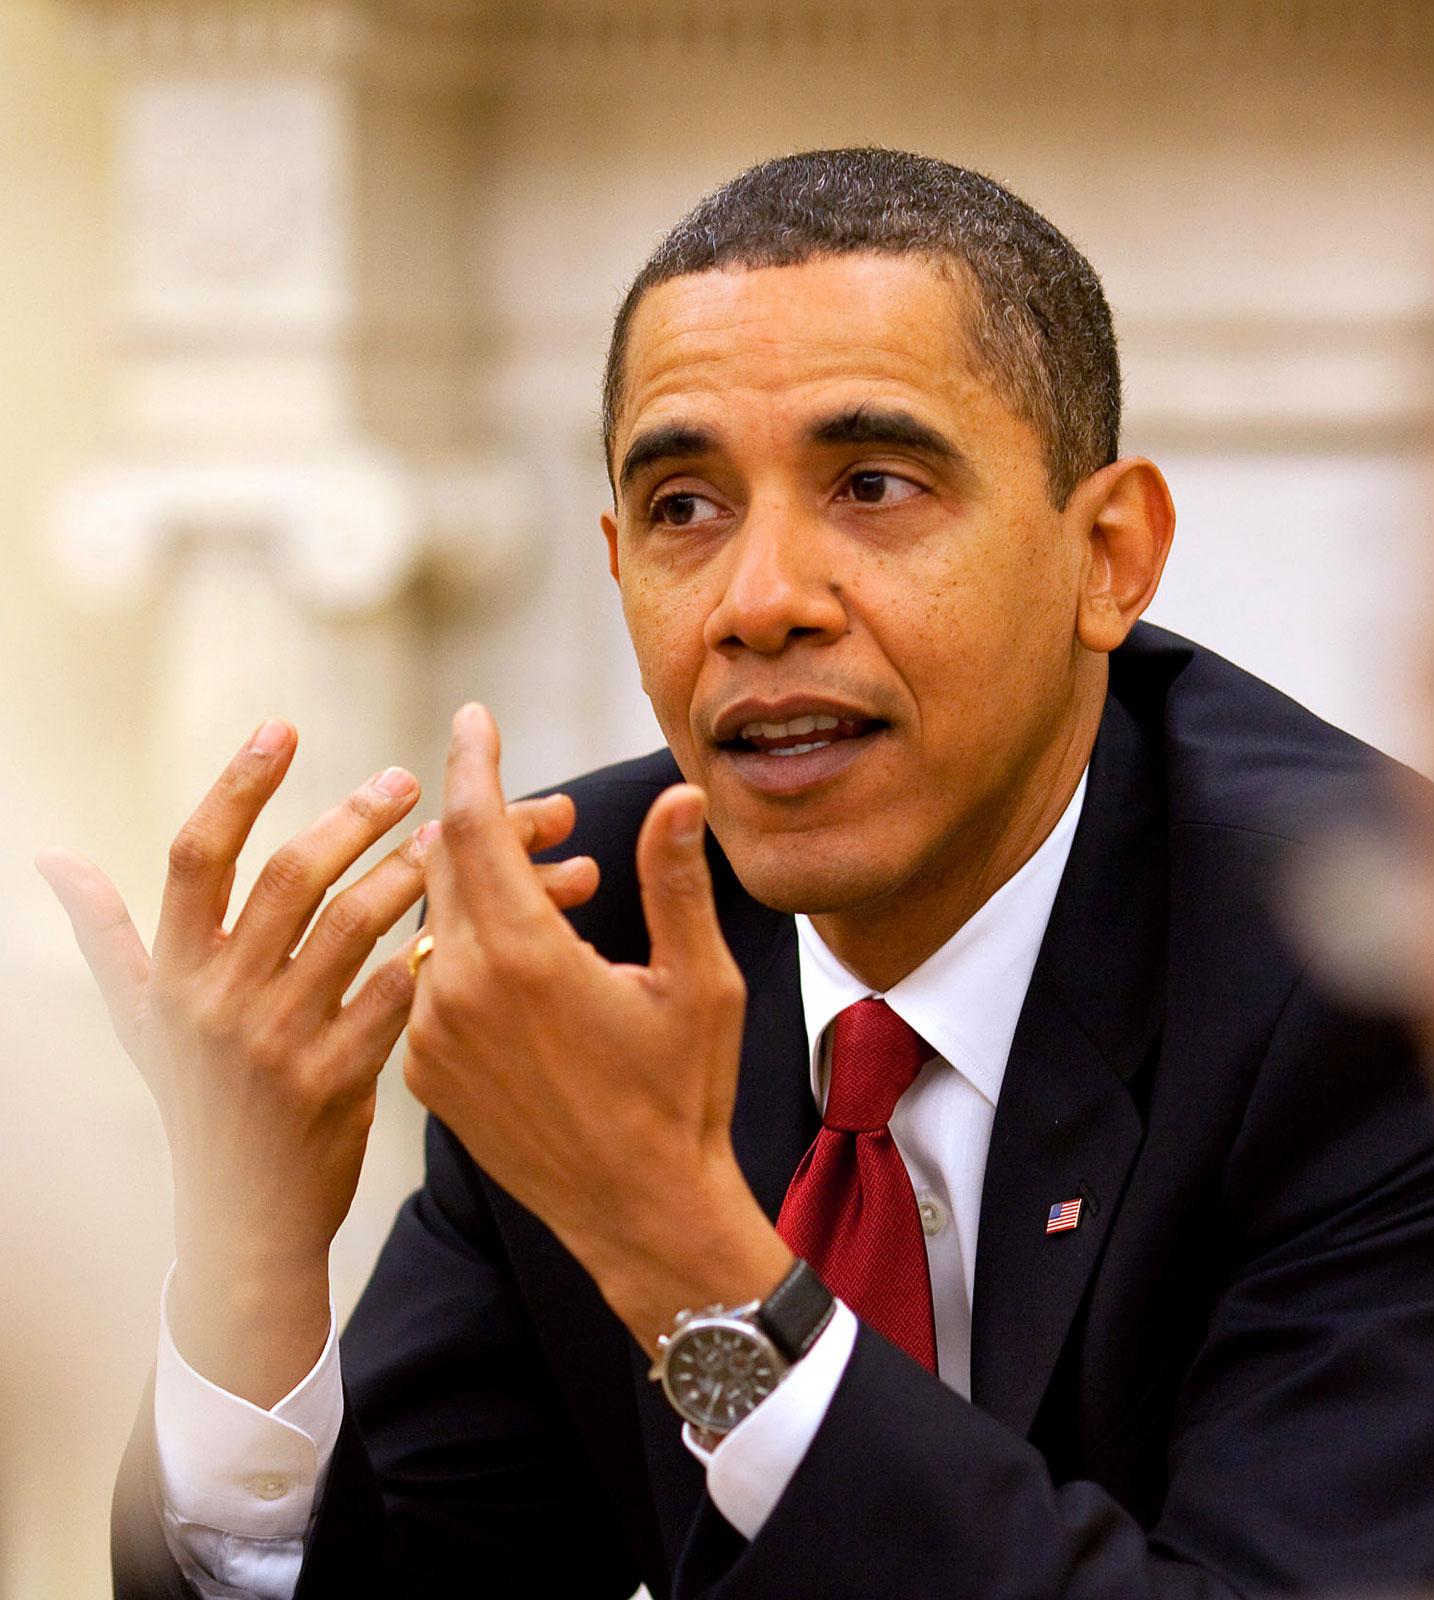 President Obama: Welcome To RolexMagazine.com...Home Of Jake's Rolex World